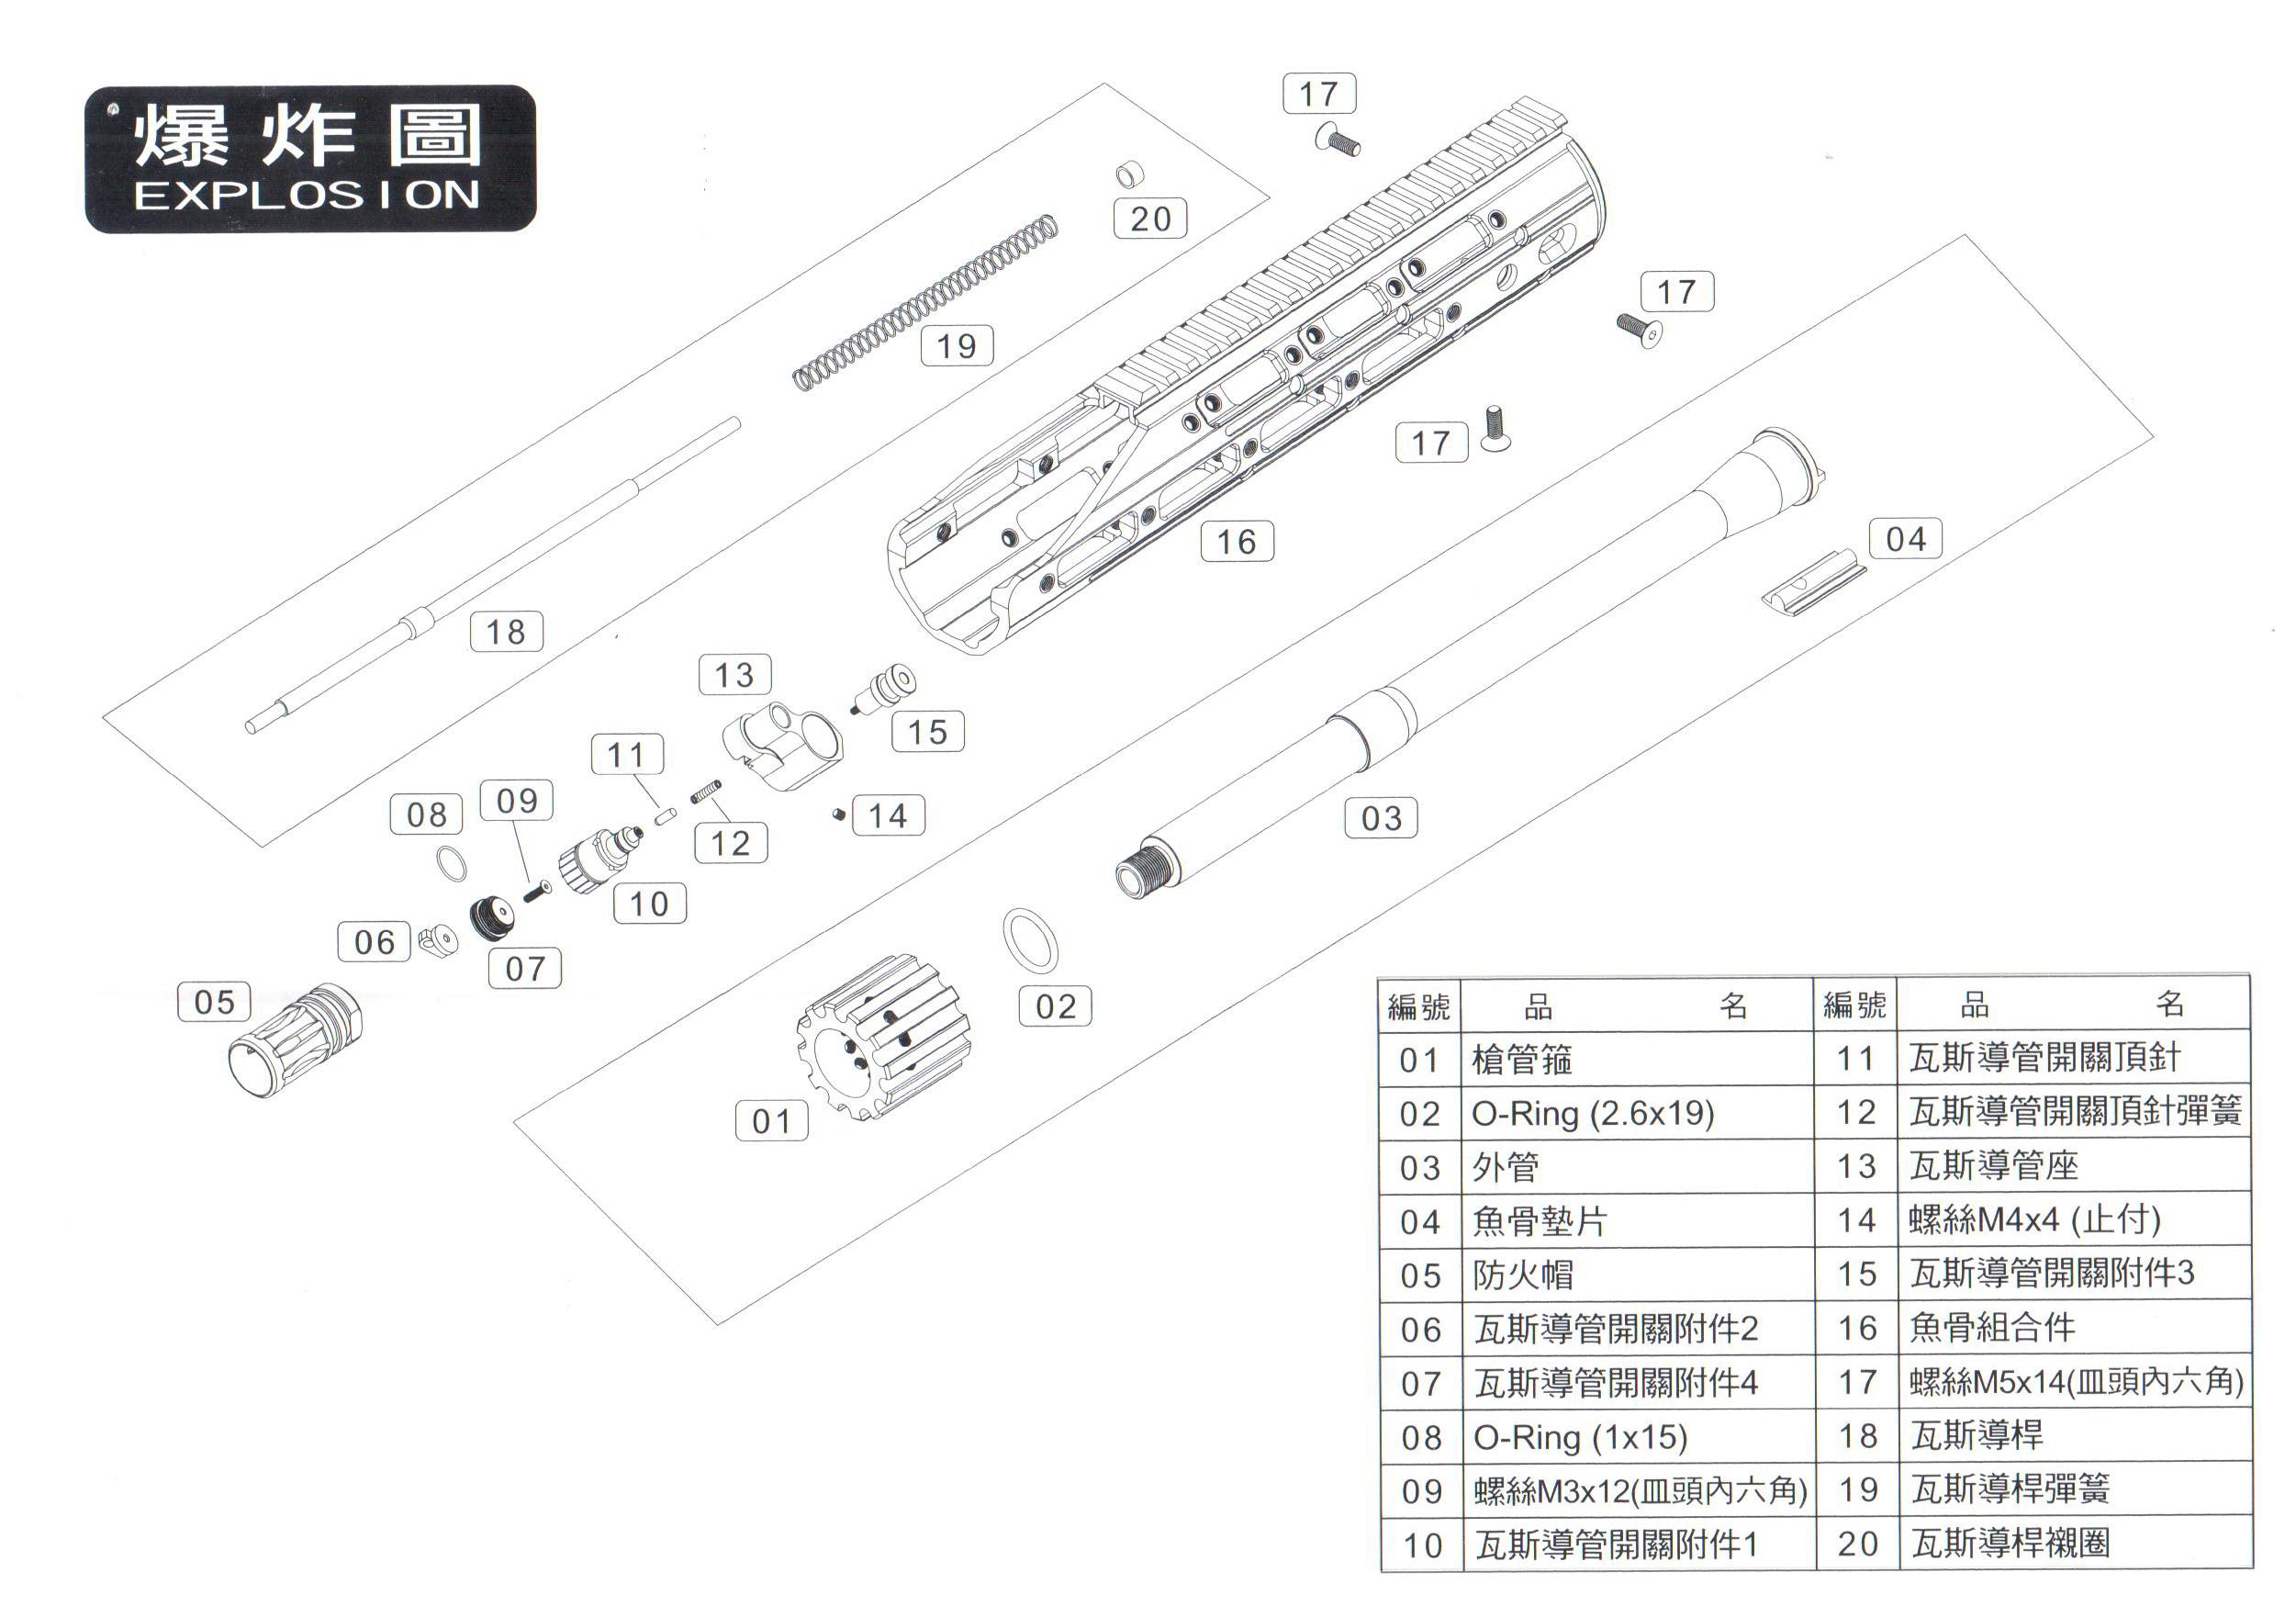 Glock 17 Slide Parts Diagram Wiring Diagrams 22 We Raptor R A S Aeg Schwarz Frei Ab 18 J Begadi 43